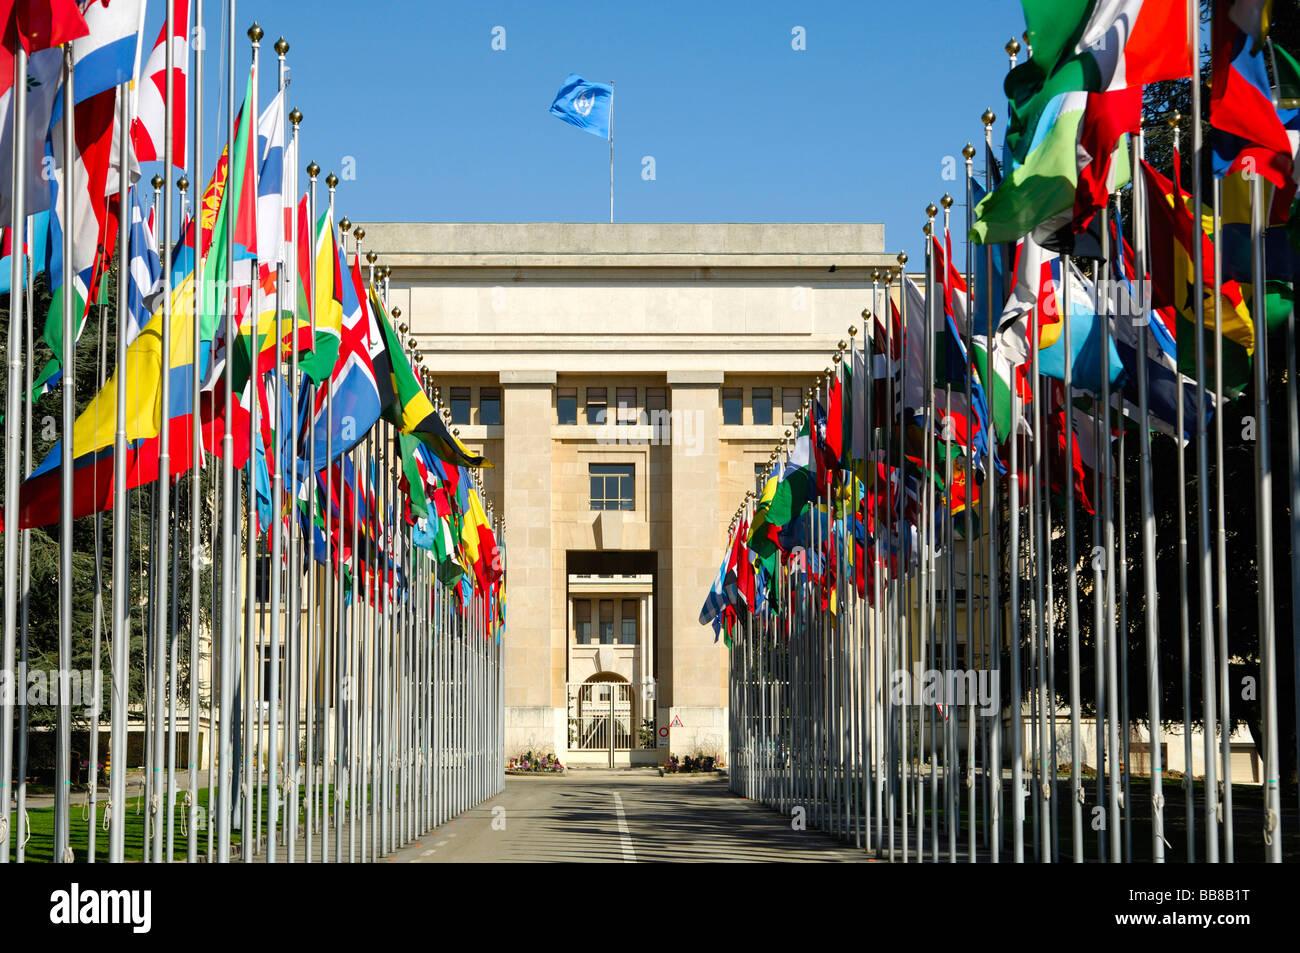 Flag complex of the United Nations, UN, Palais des Nations, Geneva, Switzerland - Stock Image